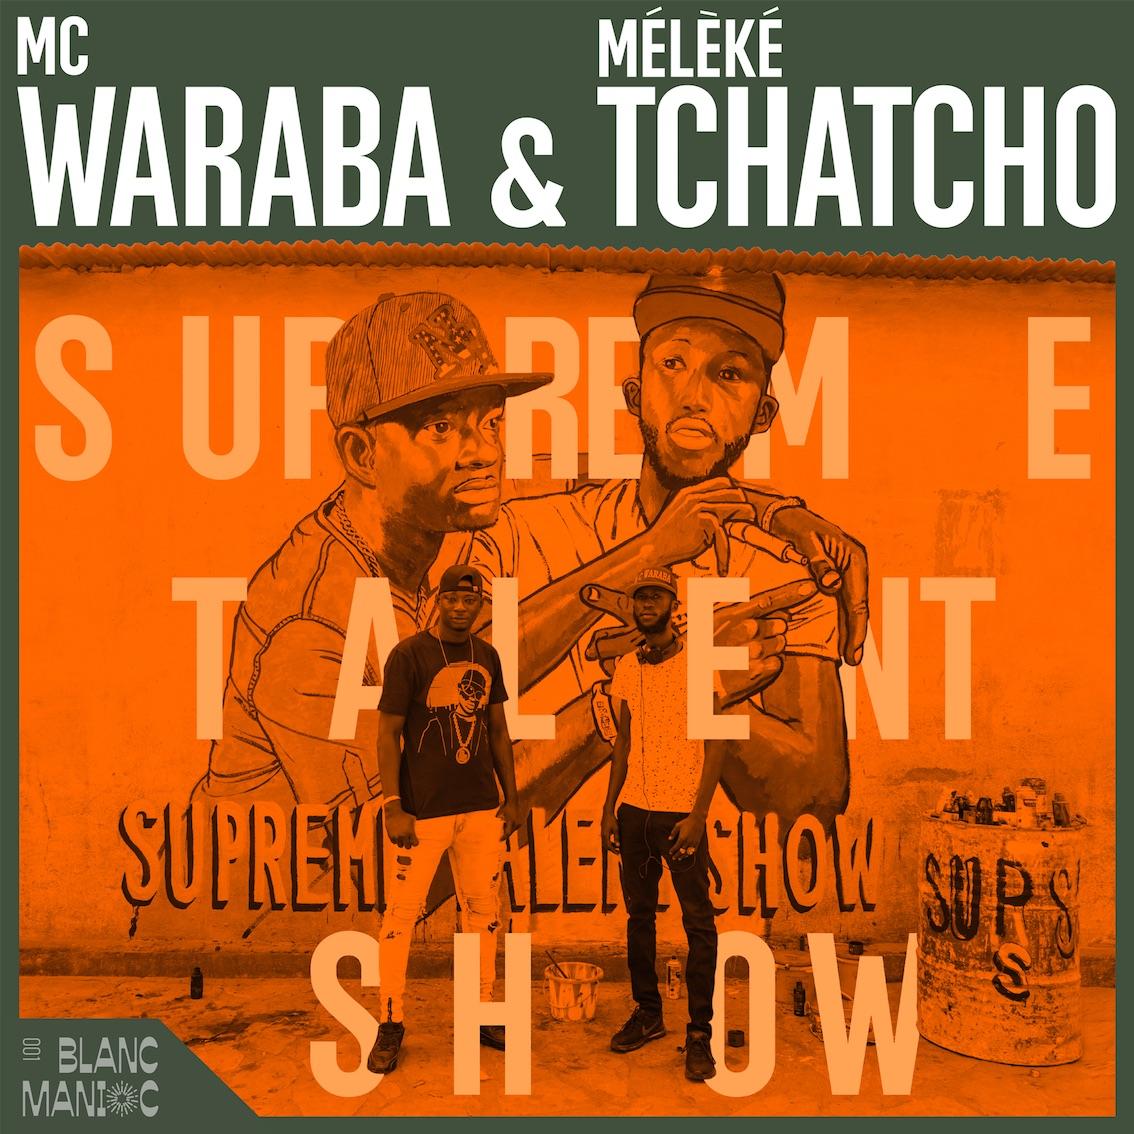 Supreme Talent Show